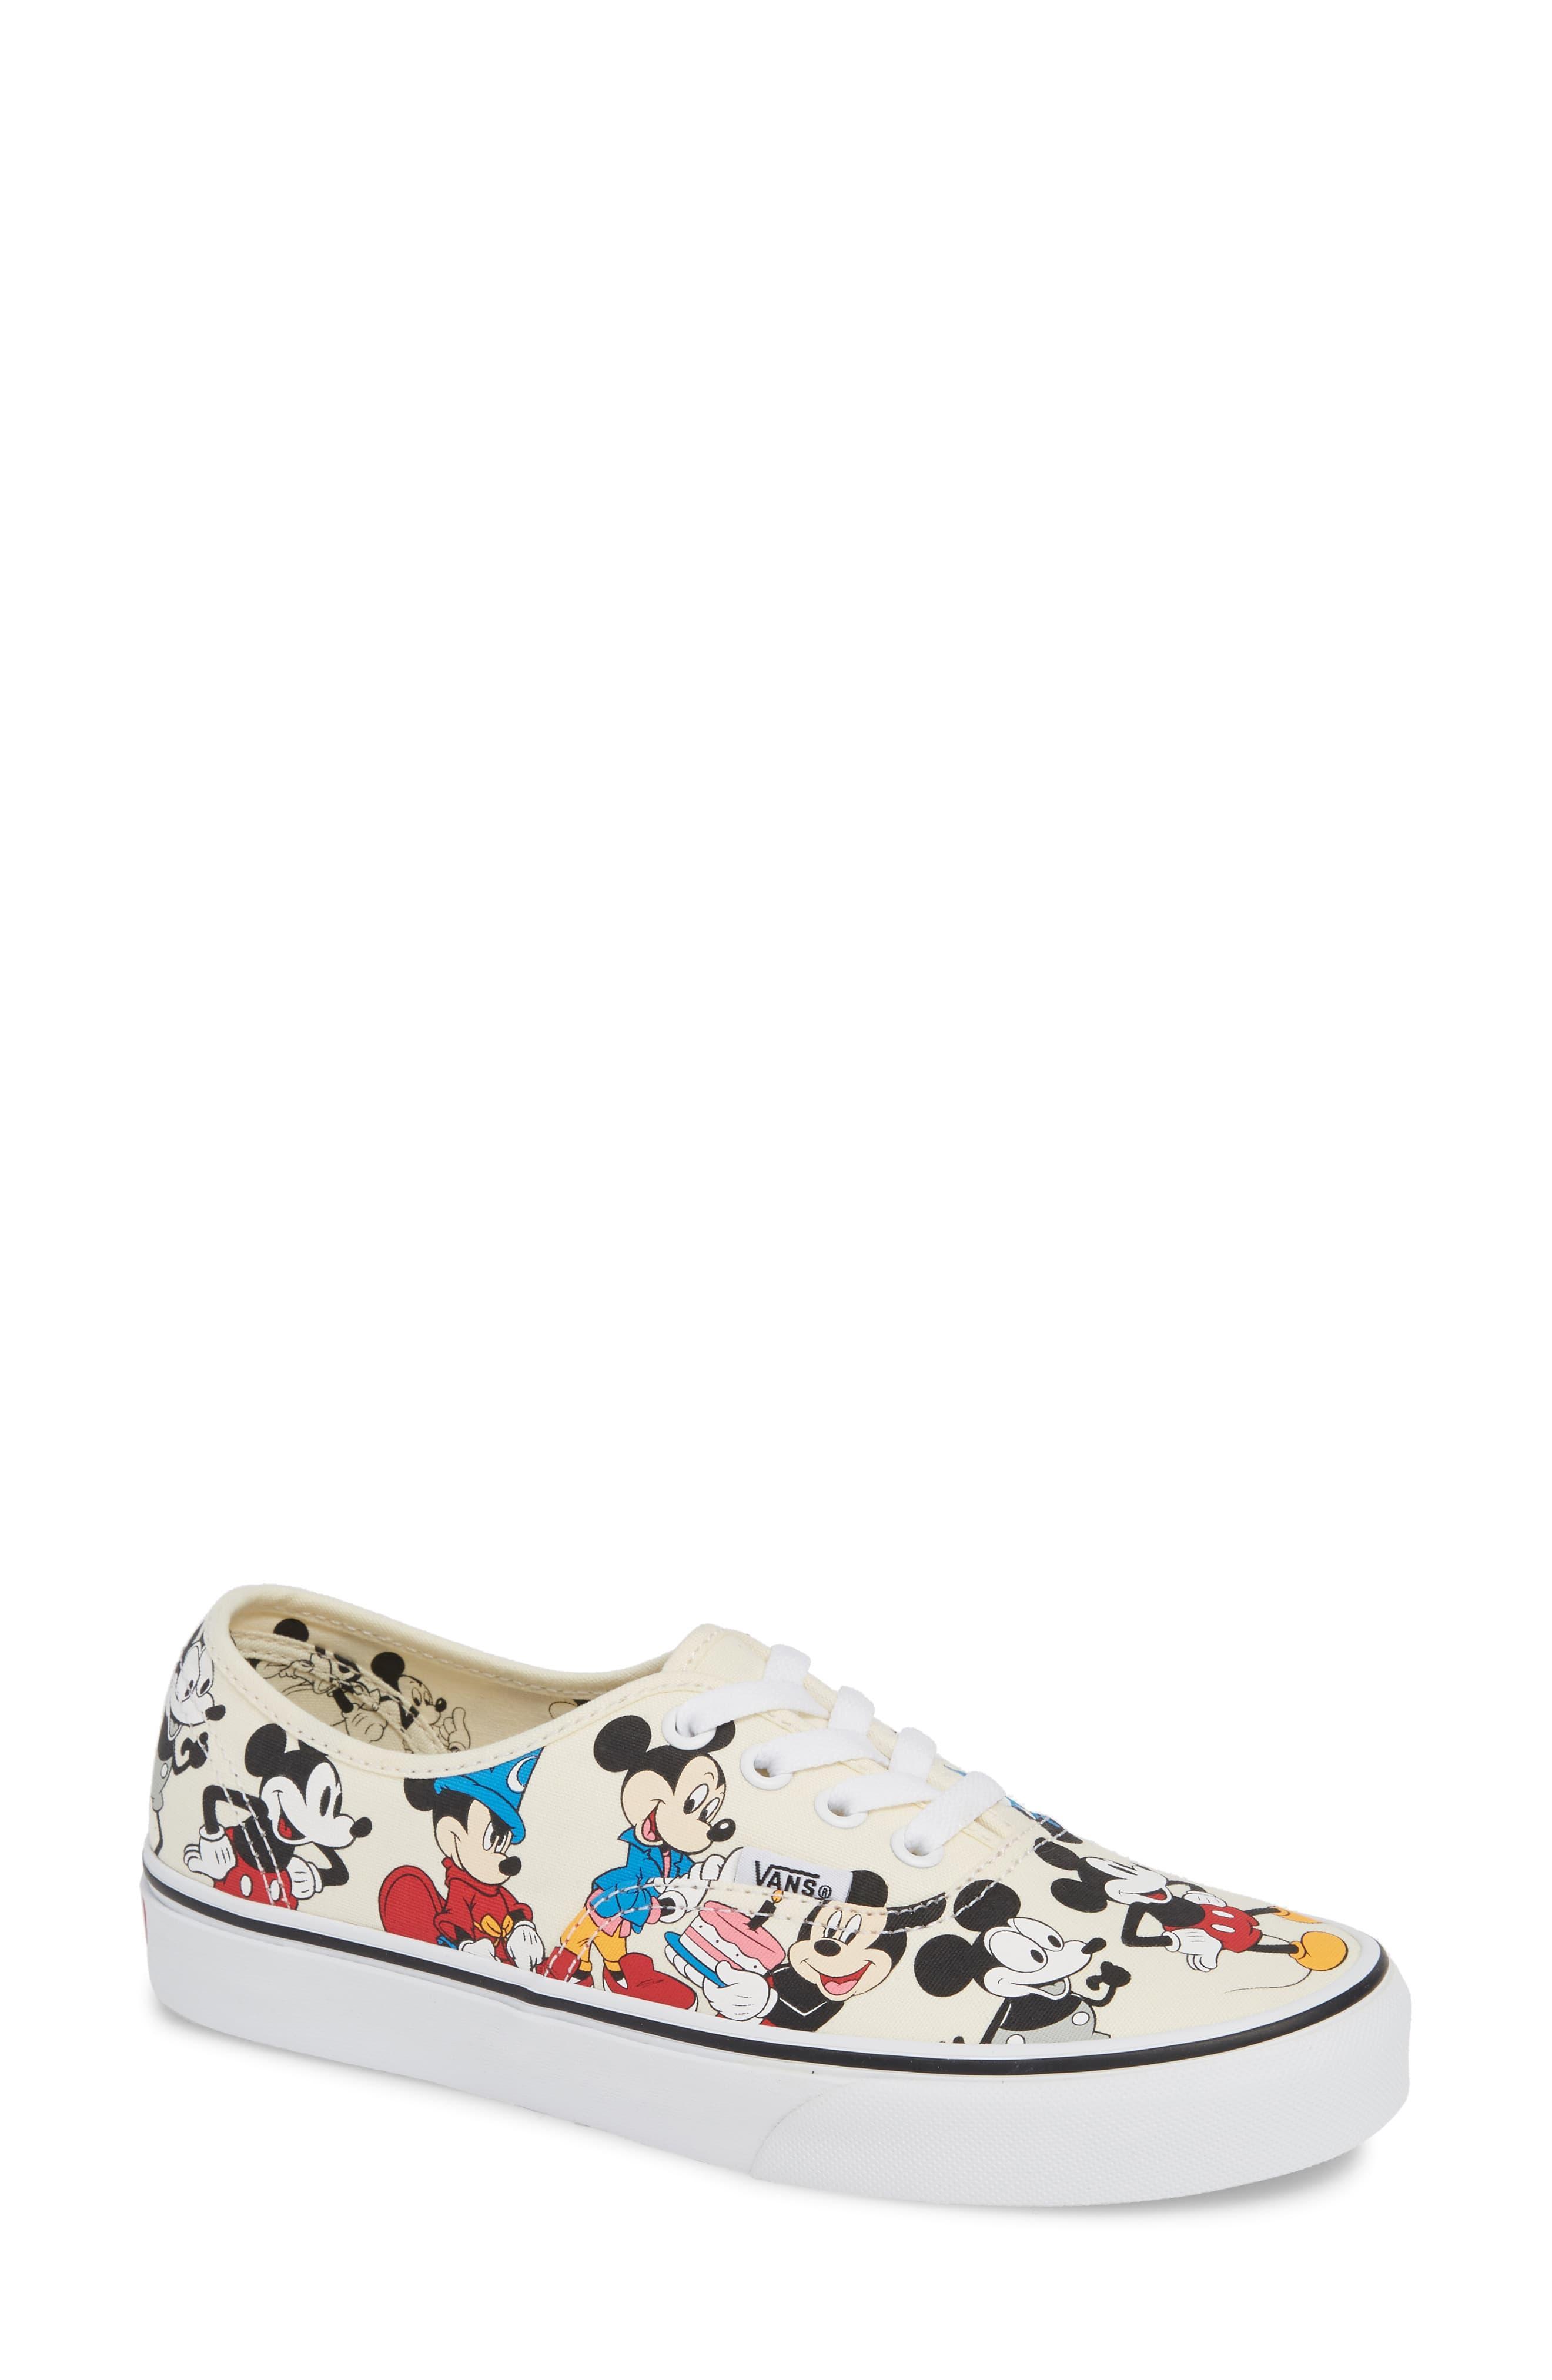 03954d5ed Vans X Disney Ua Authentic Mickey Mouse Sneaker - Lyst